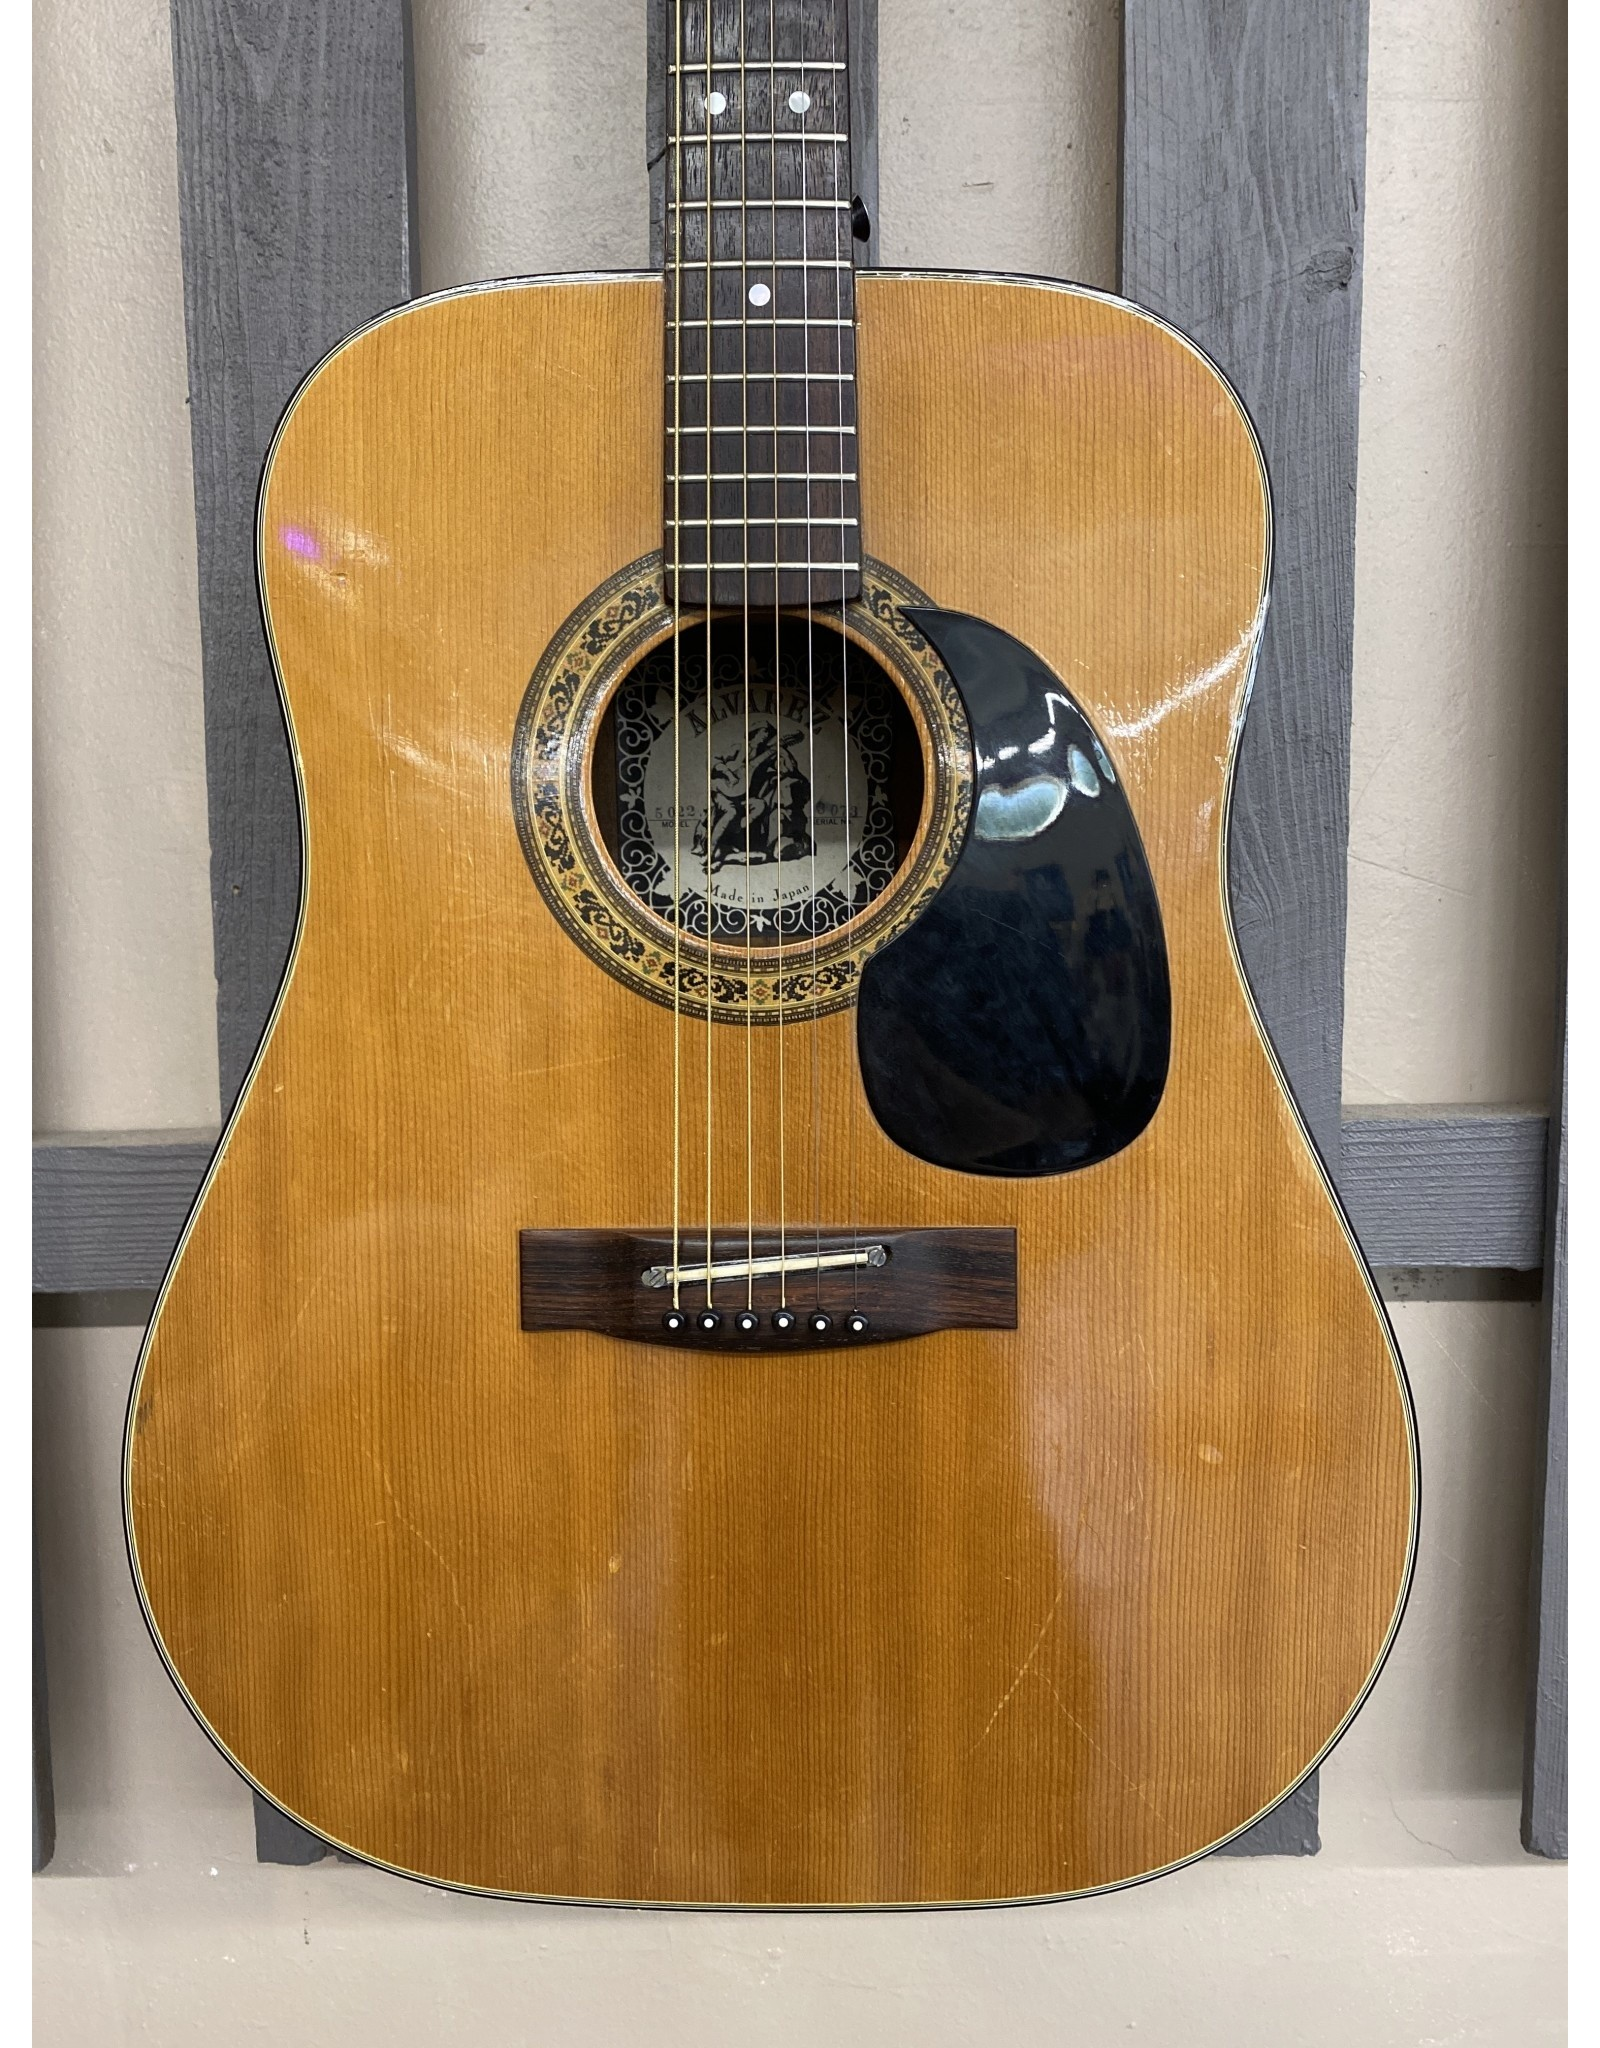 Alvarez Alvarez 5022 Acoustic Guitar (used)